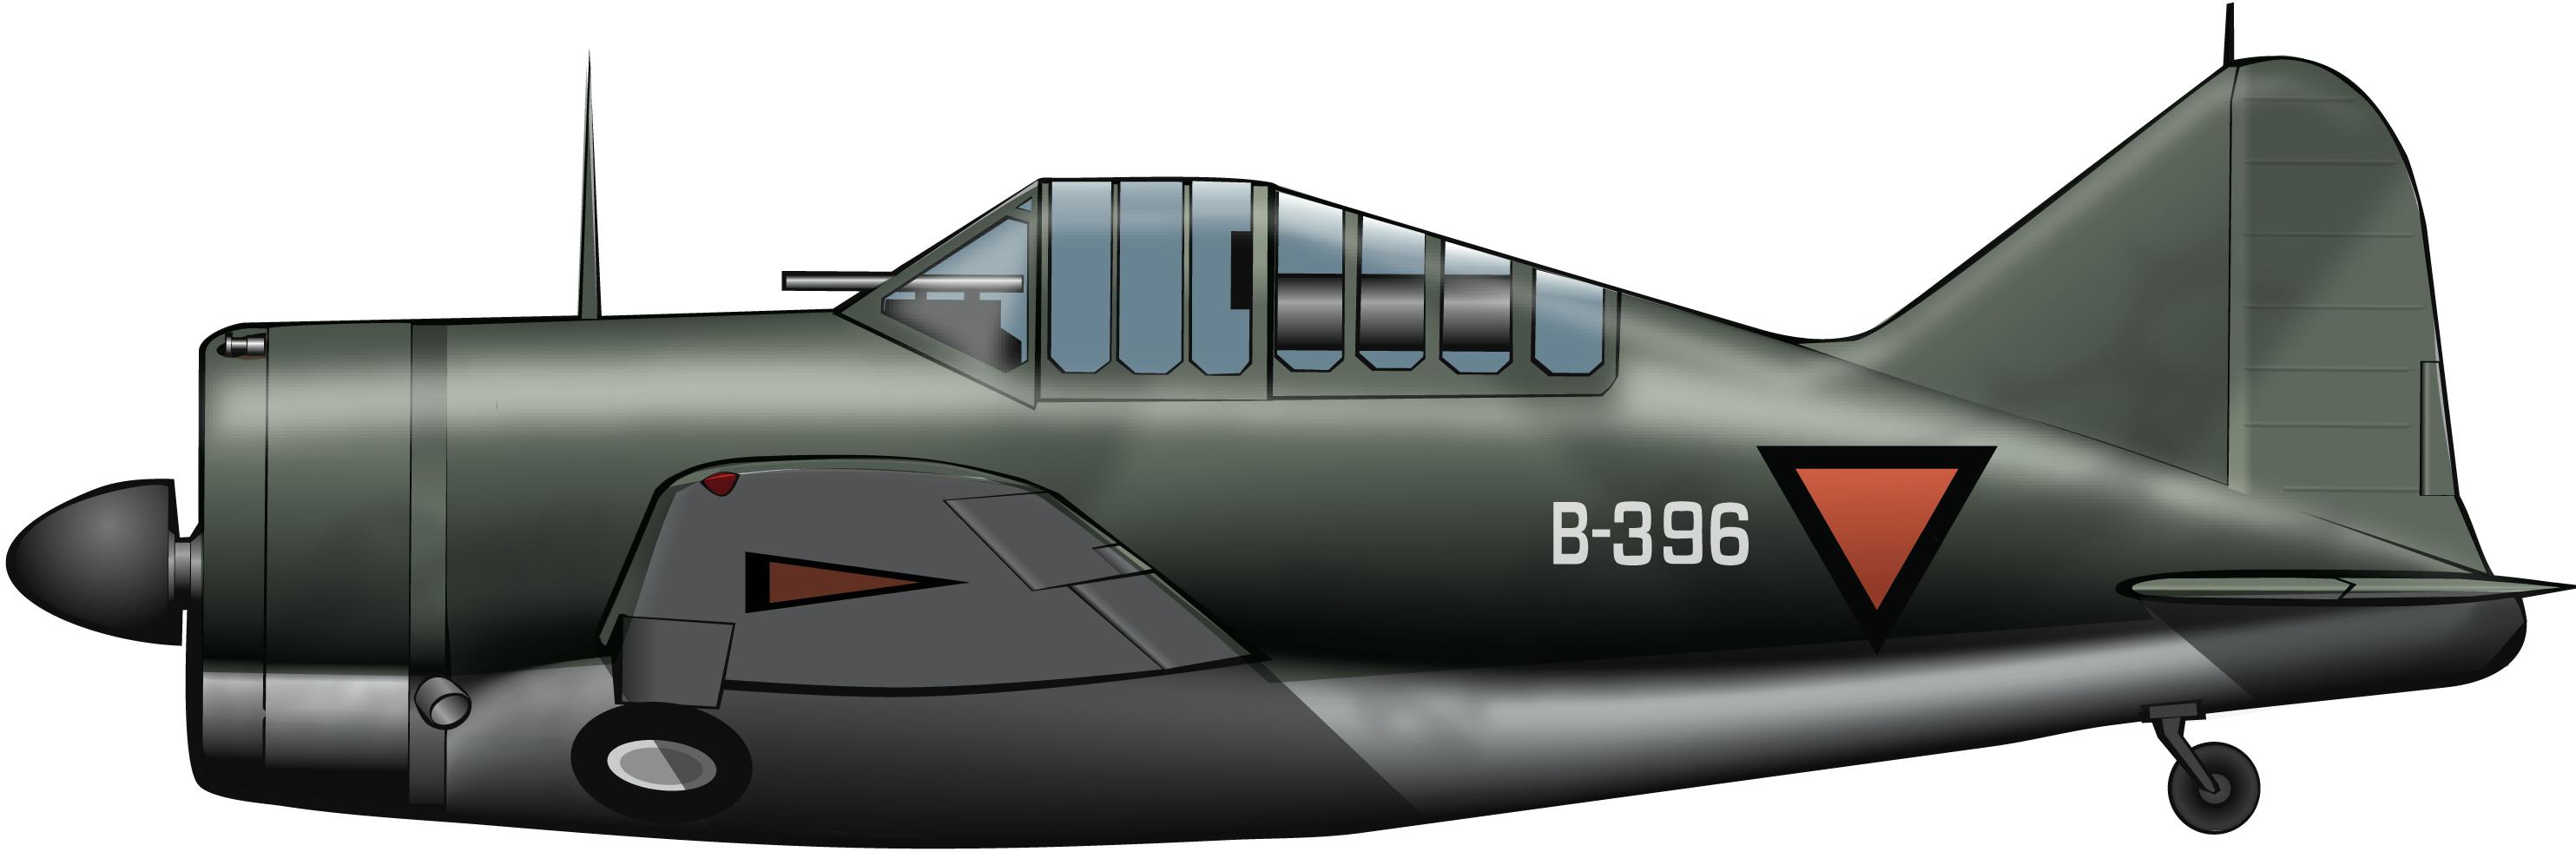 brewsterbuffalorafsingapur1942